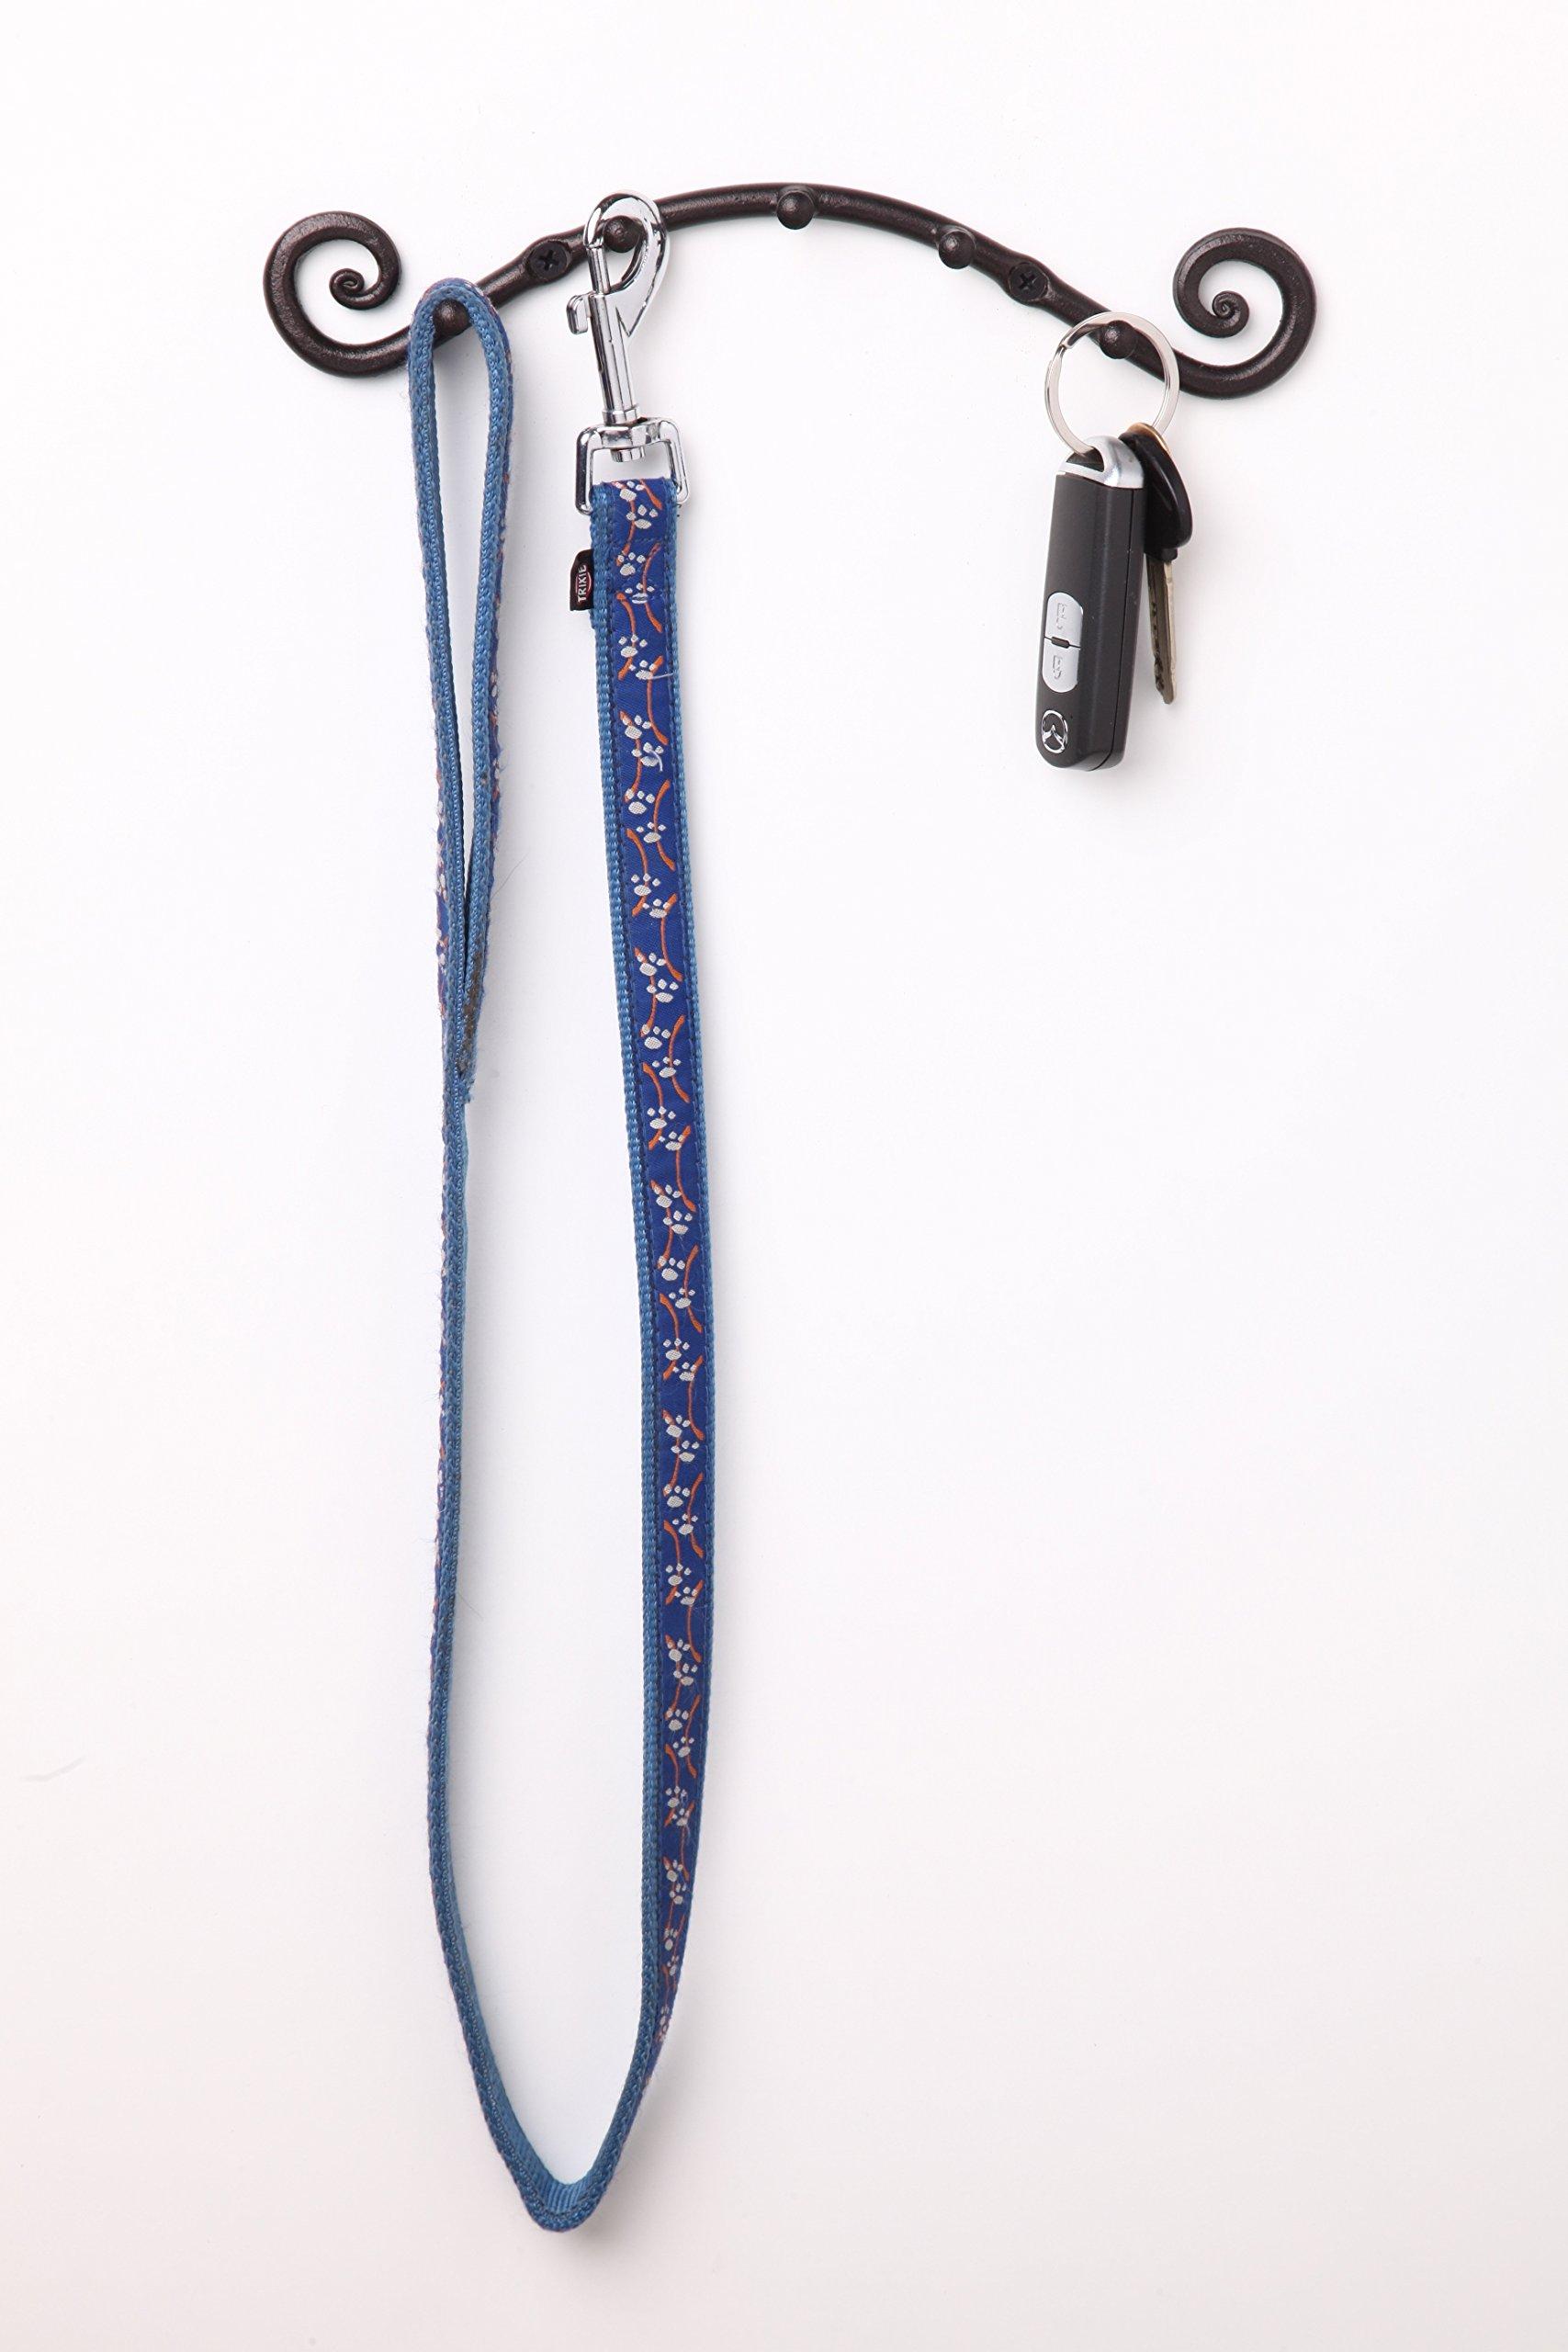 5 Hook Key Holder | Wall Mounted Hanger | Wrought Iron Key Rack Handmade by RTZEN-Décor by RTZEN (Image #3)